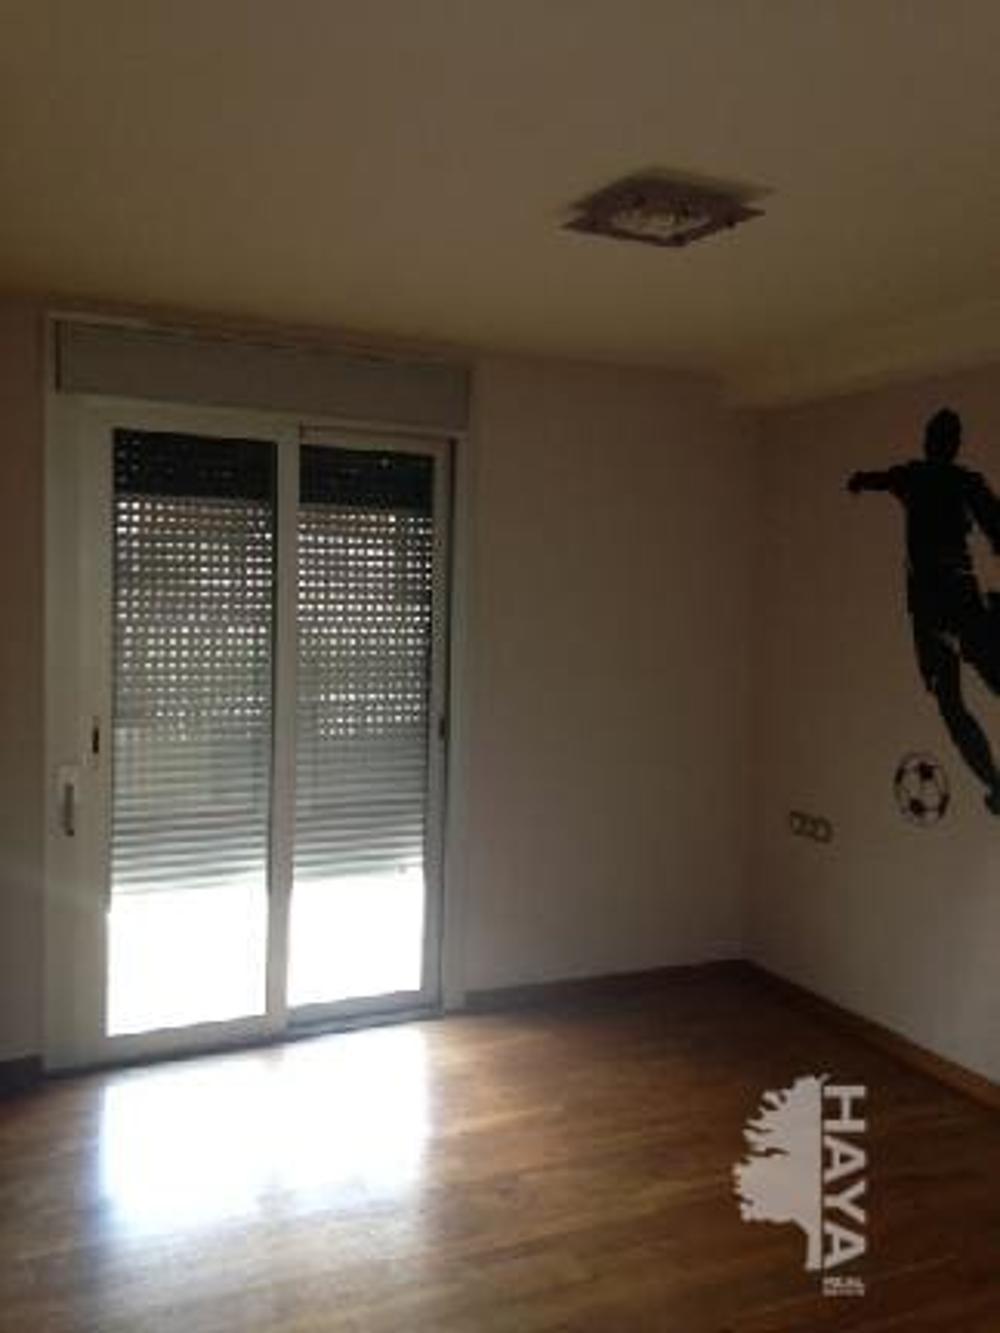 mataró centre 08302 barcelone appartement photo 3042246